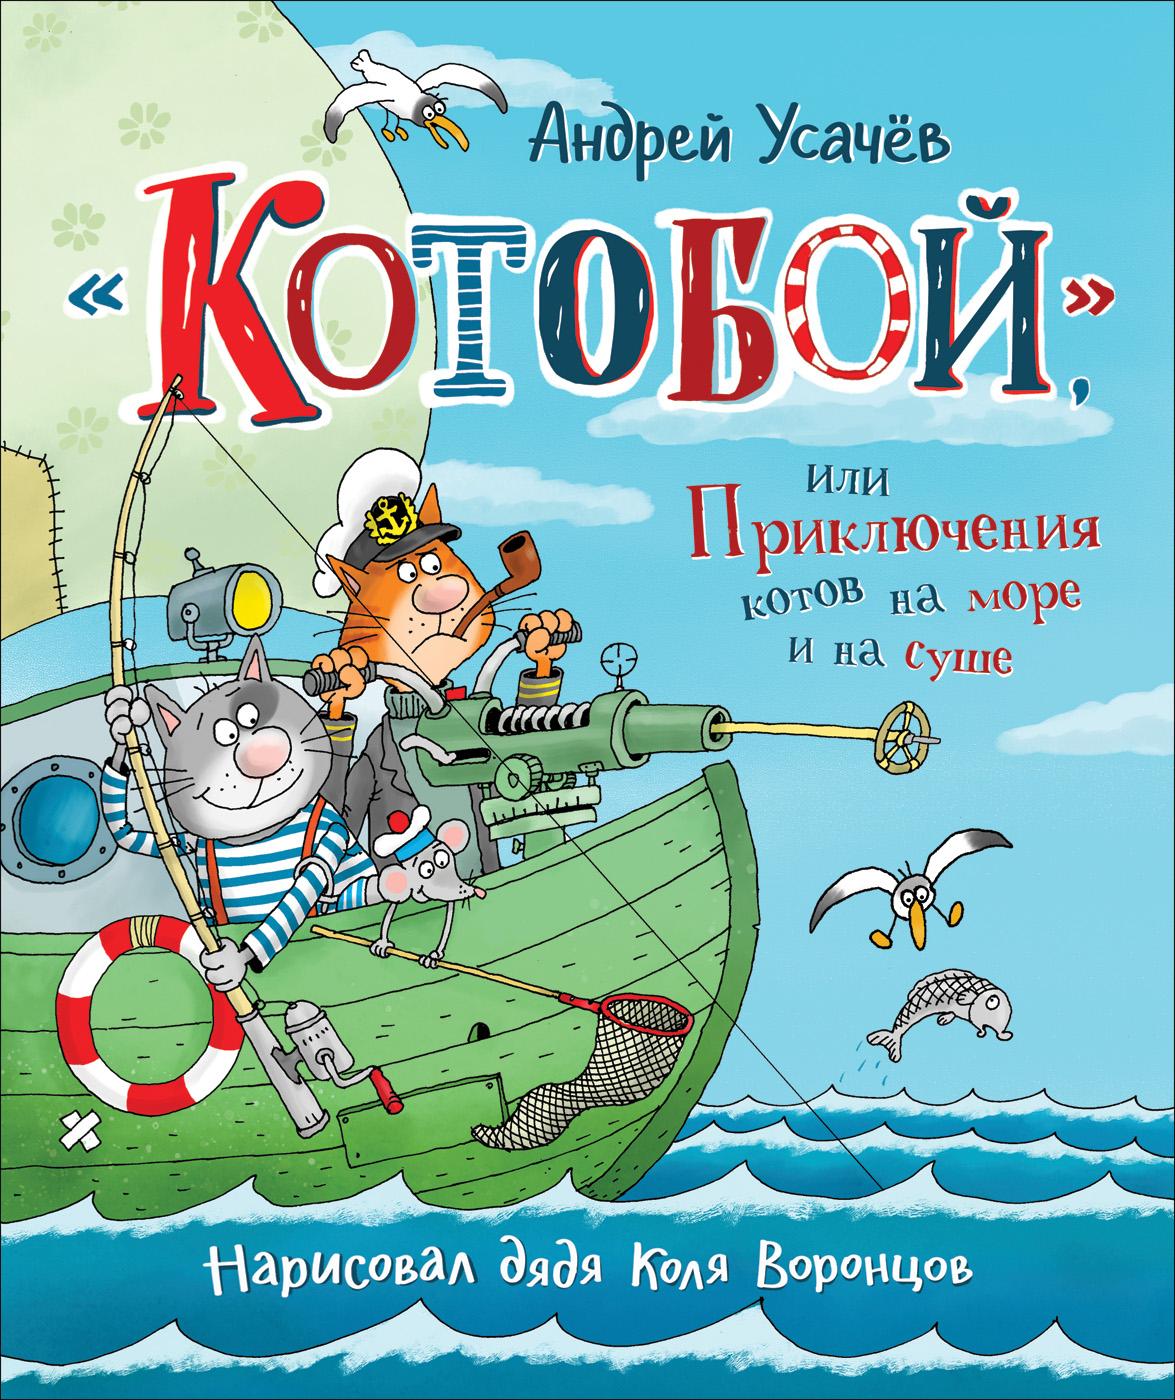 Котобой, или Приключения котов на море и на суше